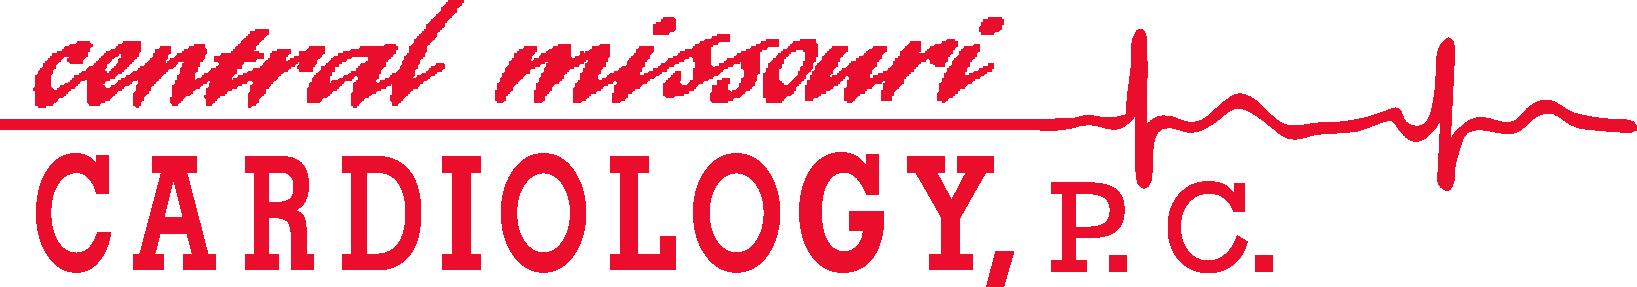 Sponsor: Central Missouri Cardiology